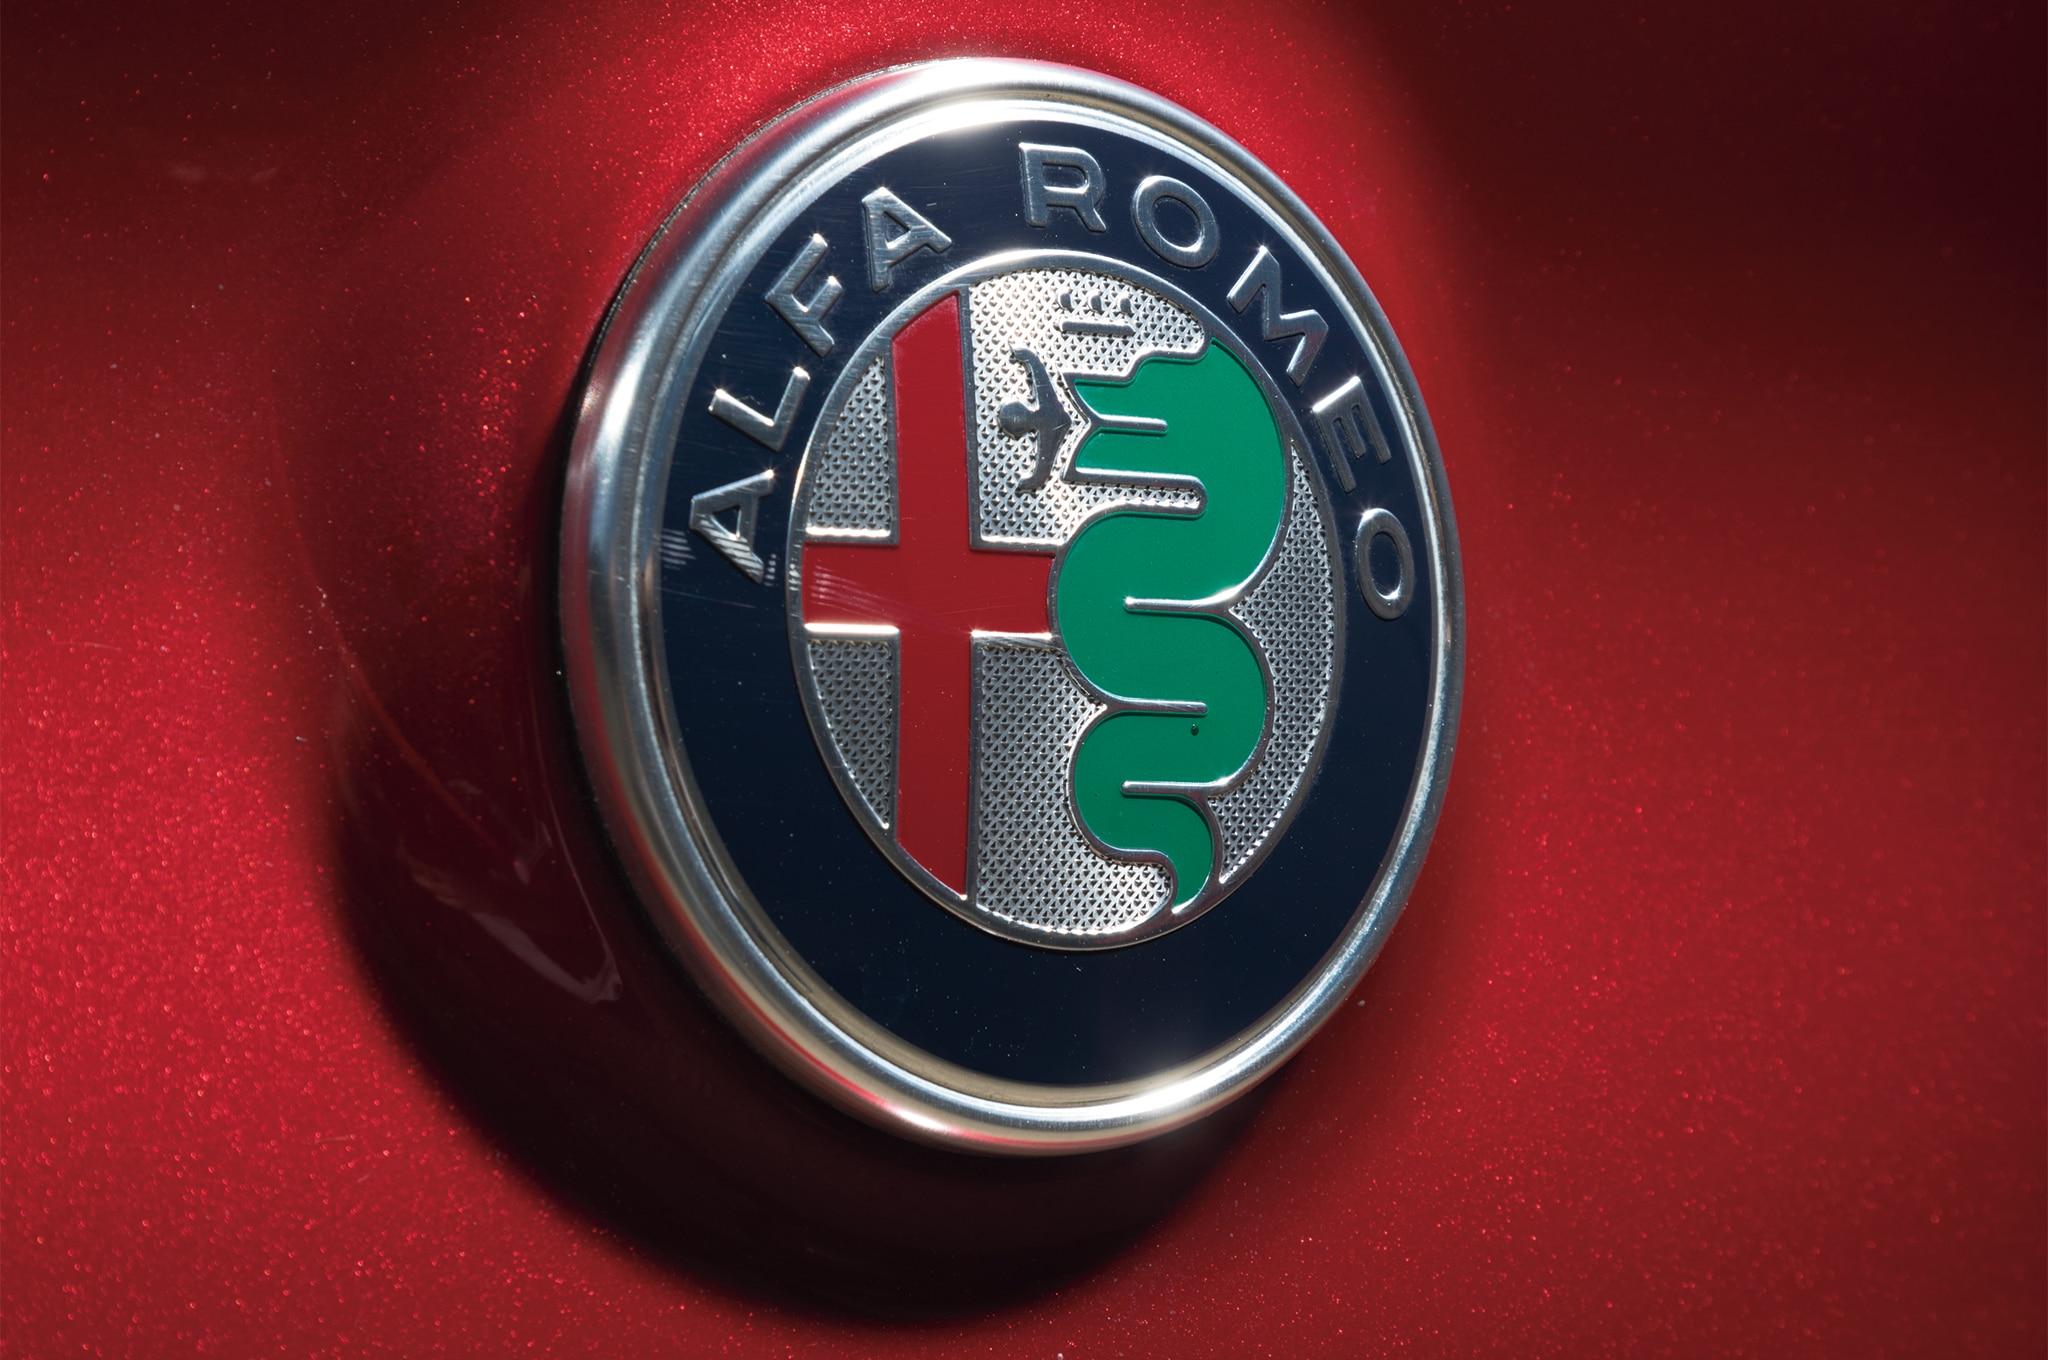 The 2017 Alfa Romeo Giulia Meets Its Predecessors In The Wild West